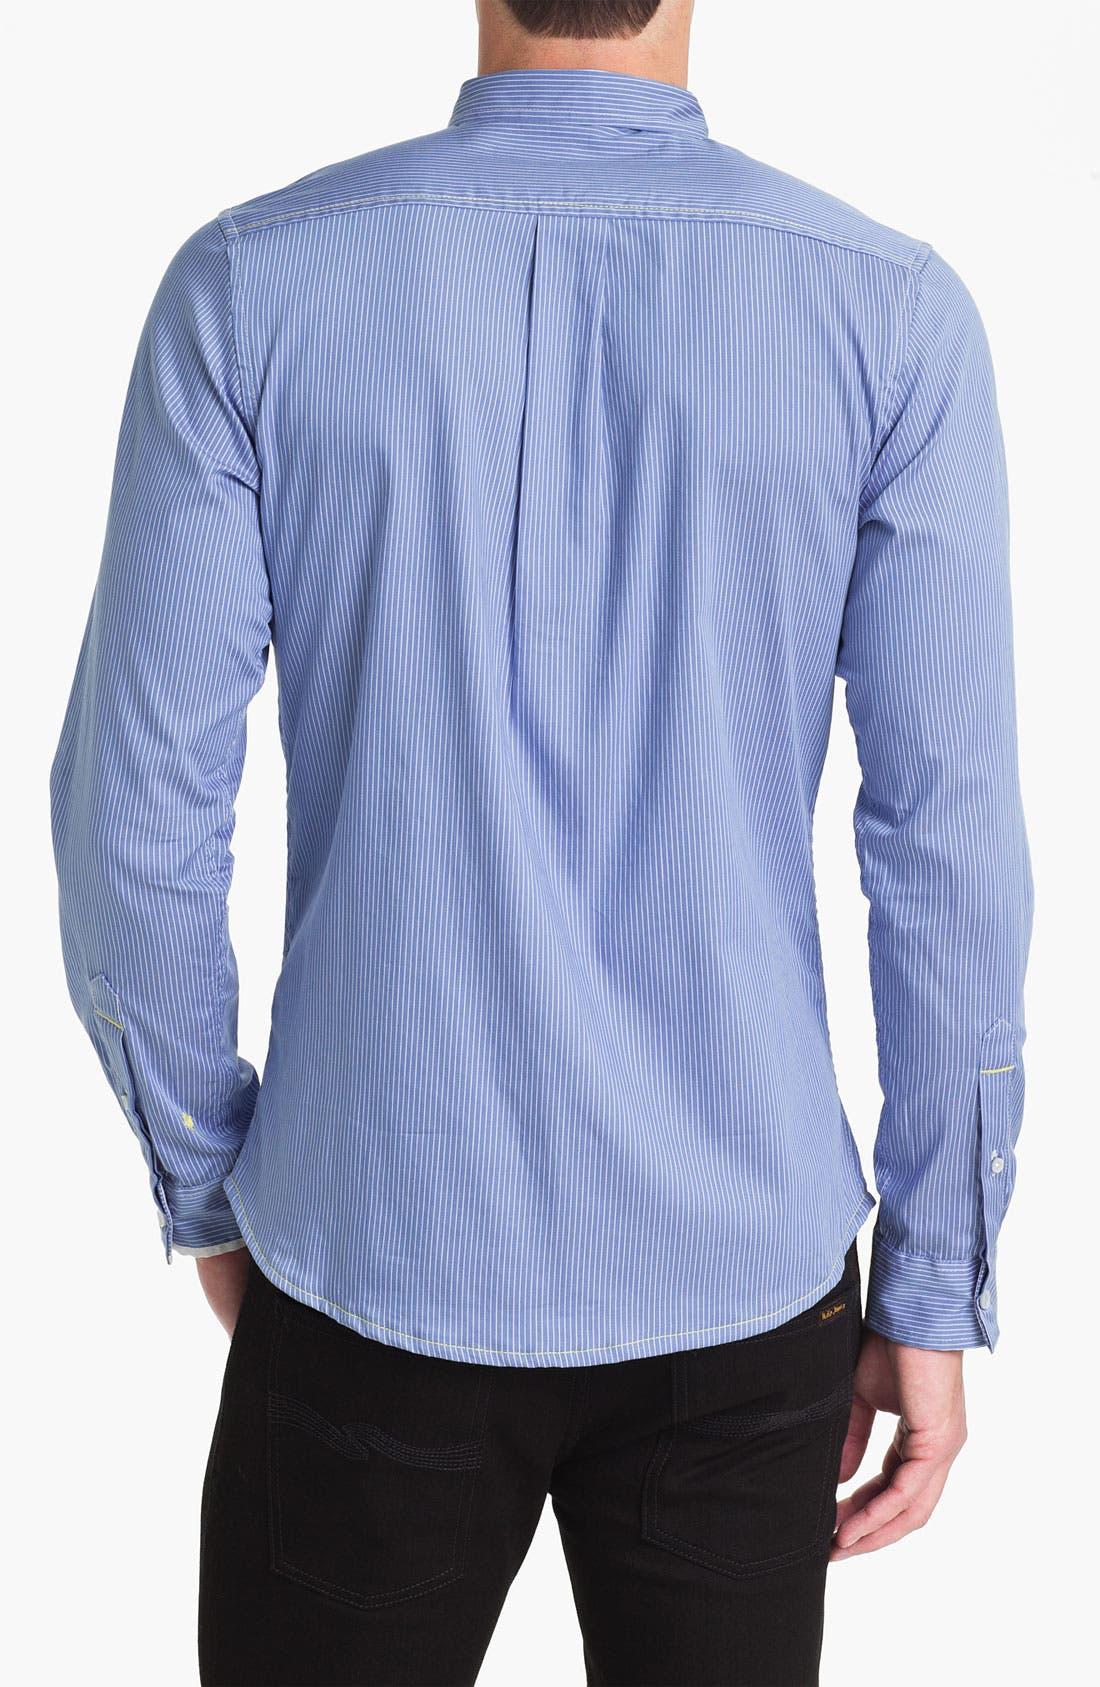 Alternate Image 2  - Descendant of Thieves Pinstripe Woven Shirt